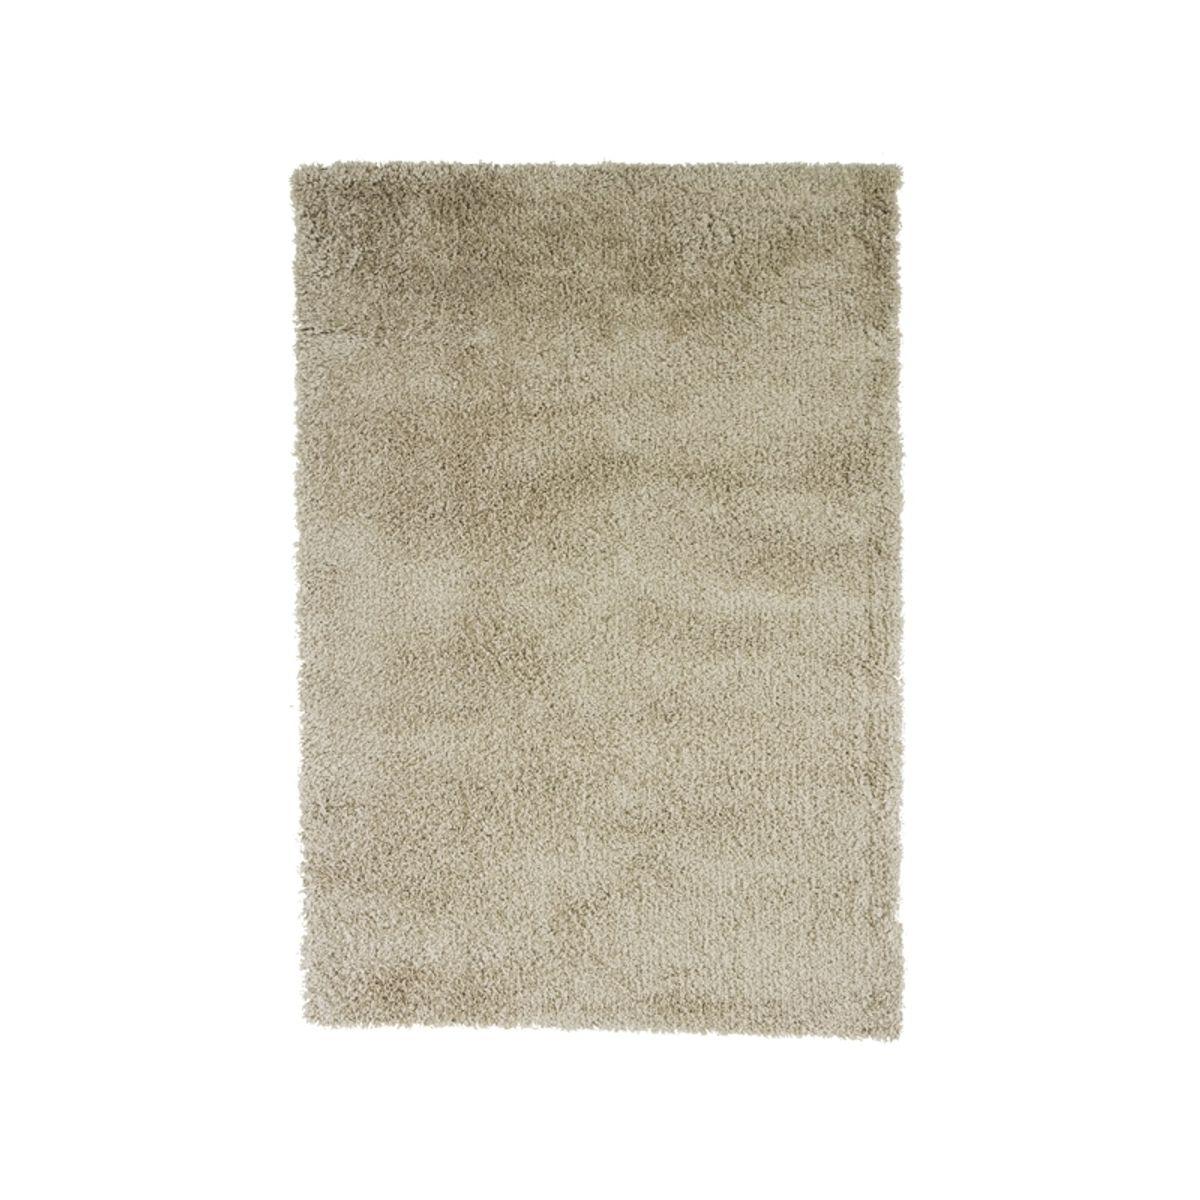 Tapis shaggy blanc craie Softy 200x290 cm